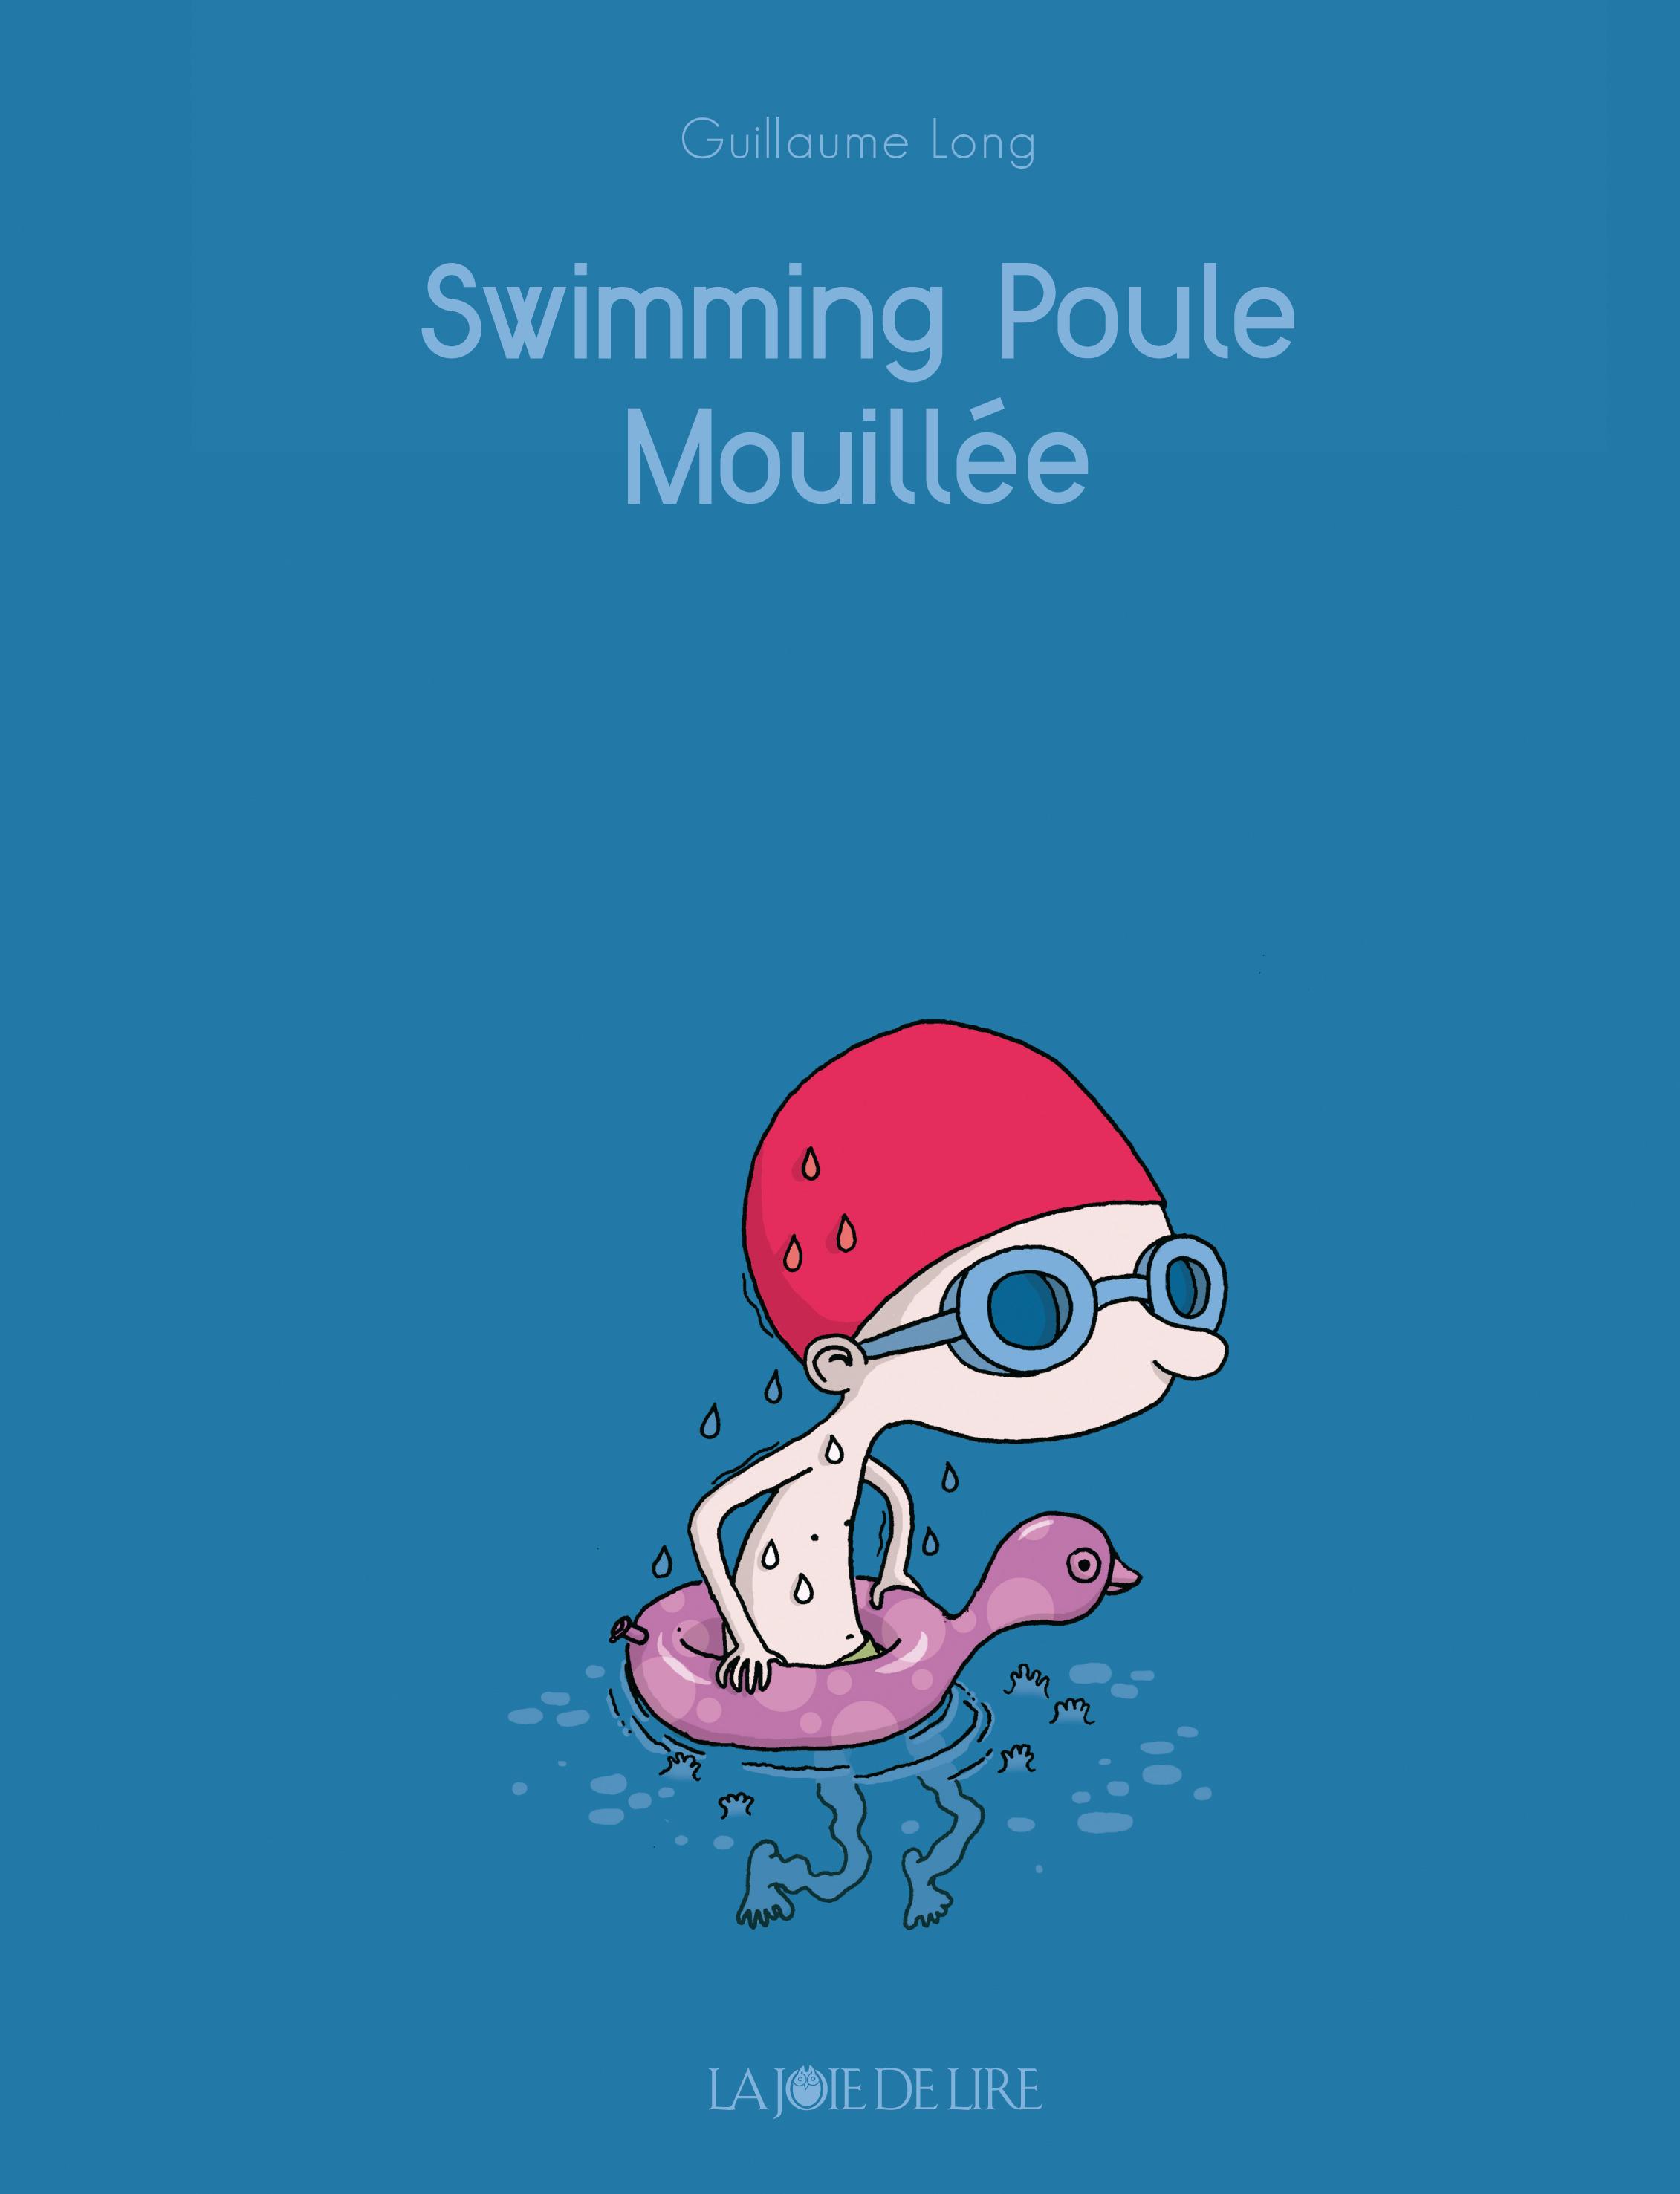 http://www.lajoiedelire.ch/wp-content/uploads/2015/07/swimm_poule_RVB.jpg